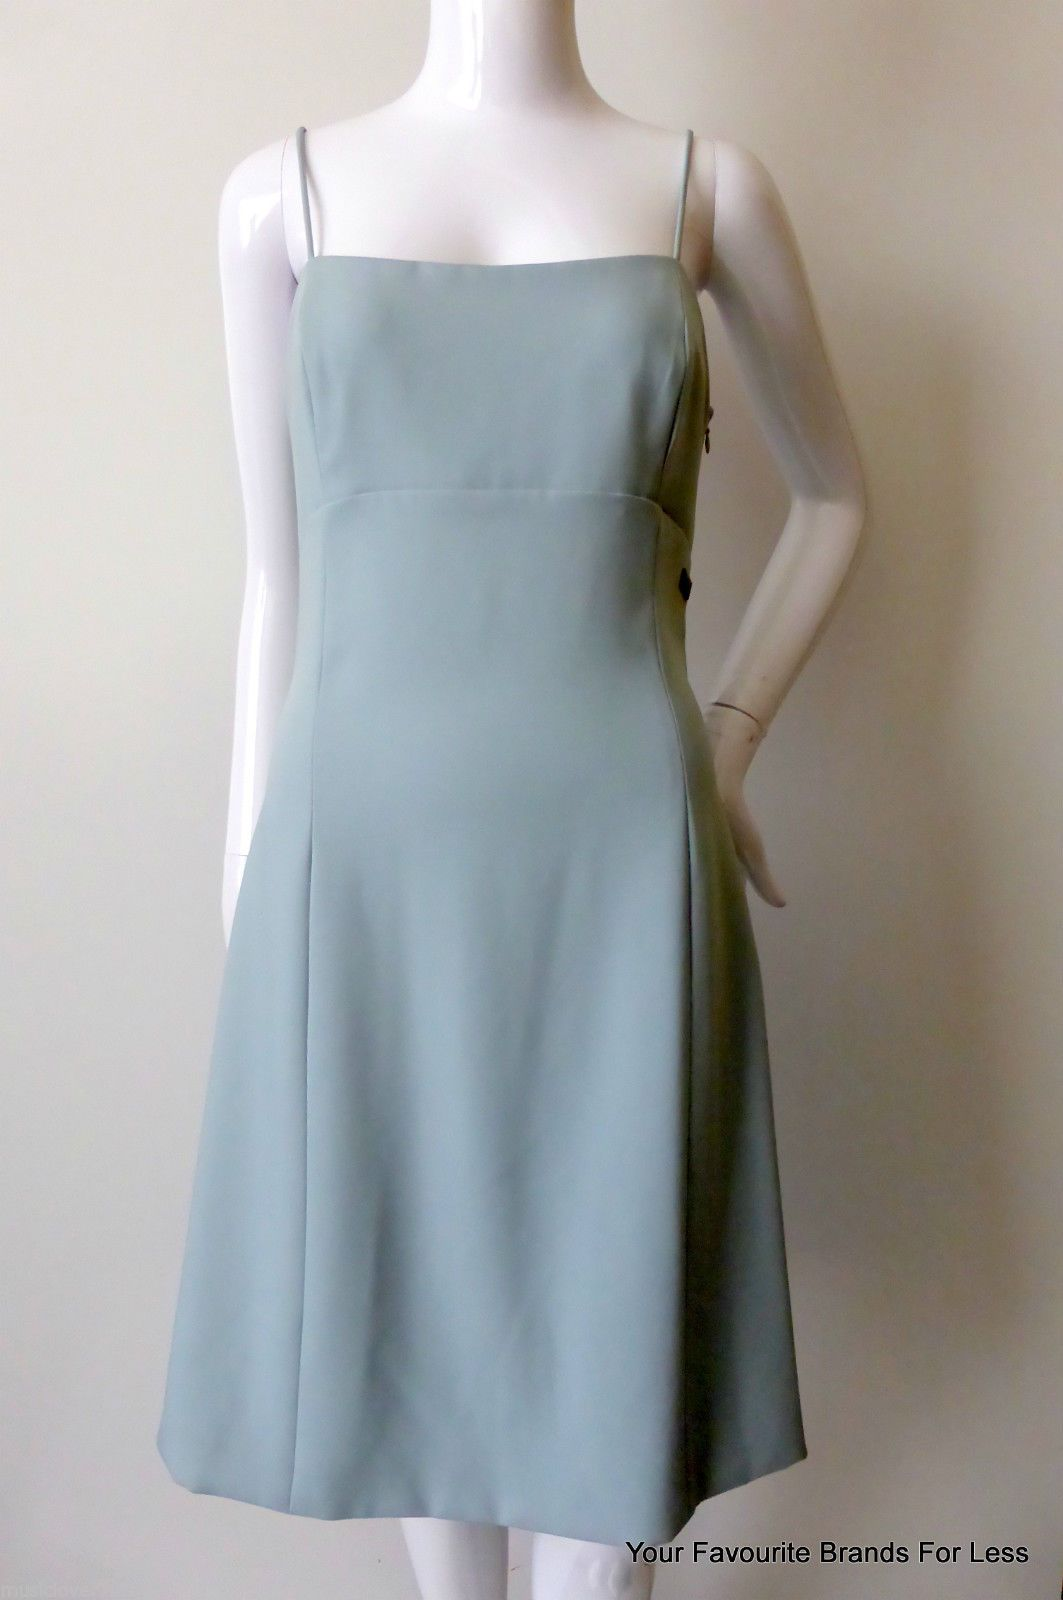 Karl Lagerfeld Dress Size AU 8 - 10 US 4 - 6 IT 40 Light Blue Made ...